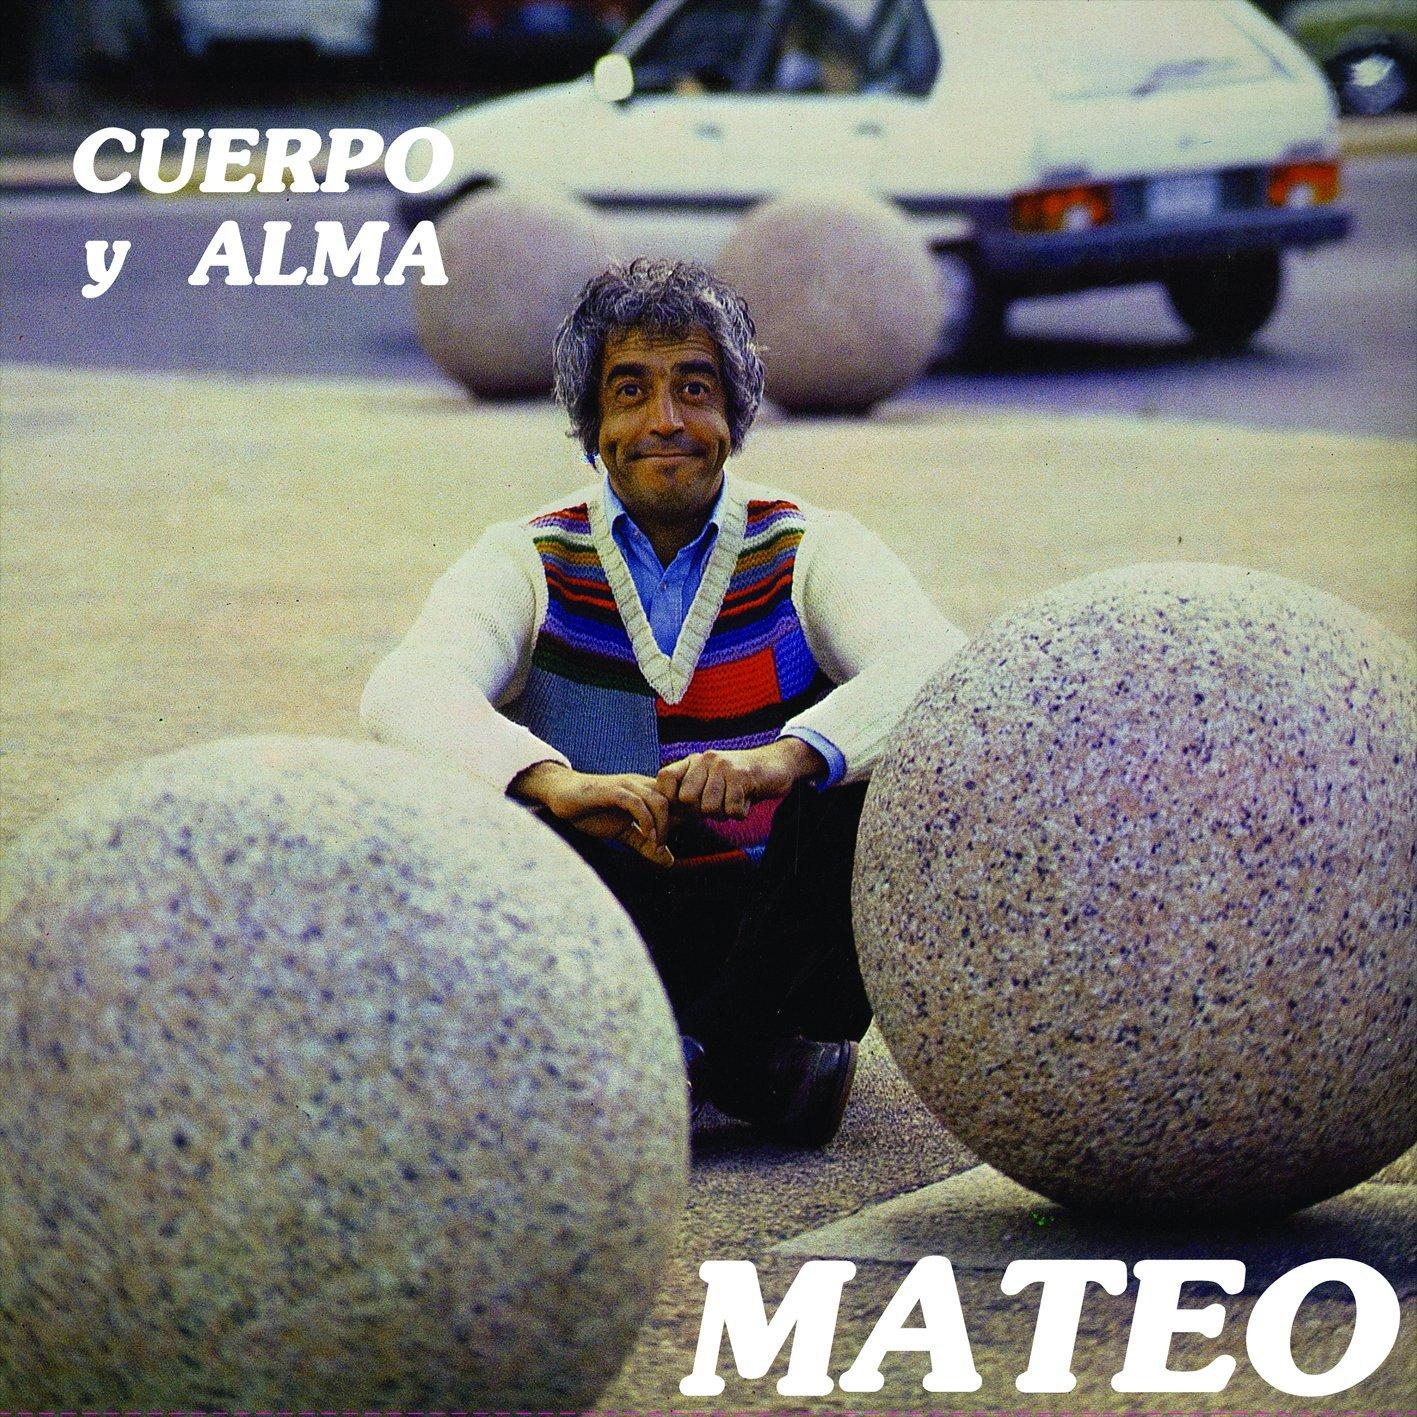 Cuerpo y Alma / Eduardo Mateoのジャケット